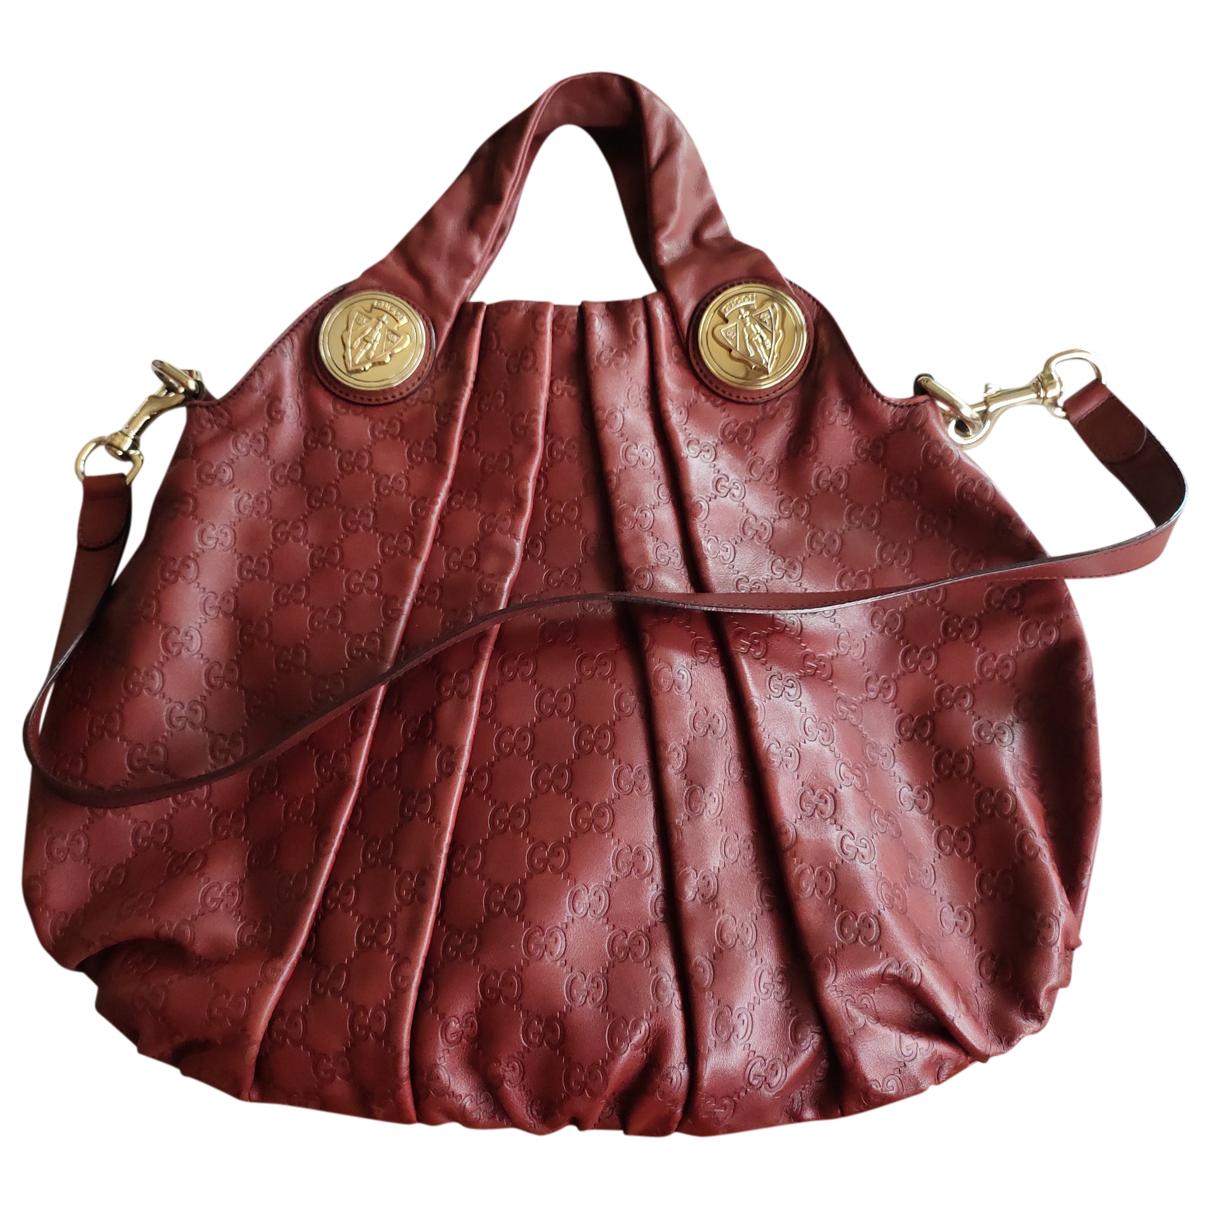 Gucci Hysteria Handtasche in  Rot Leder